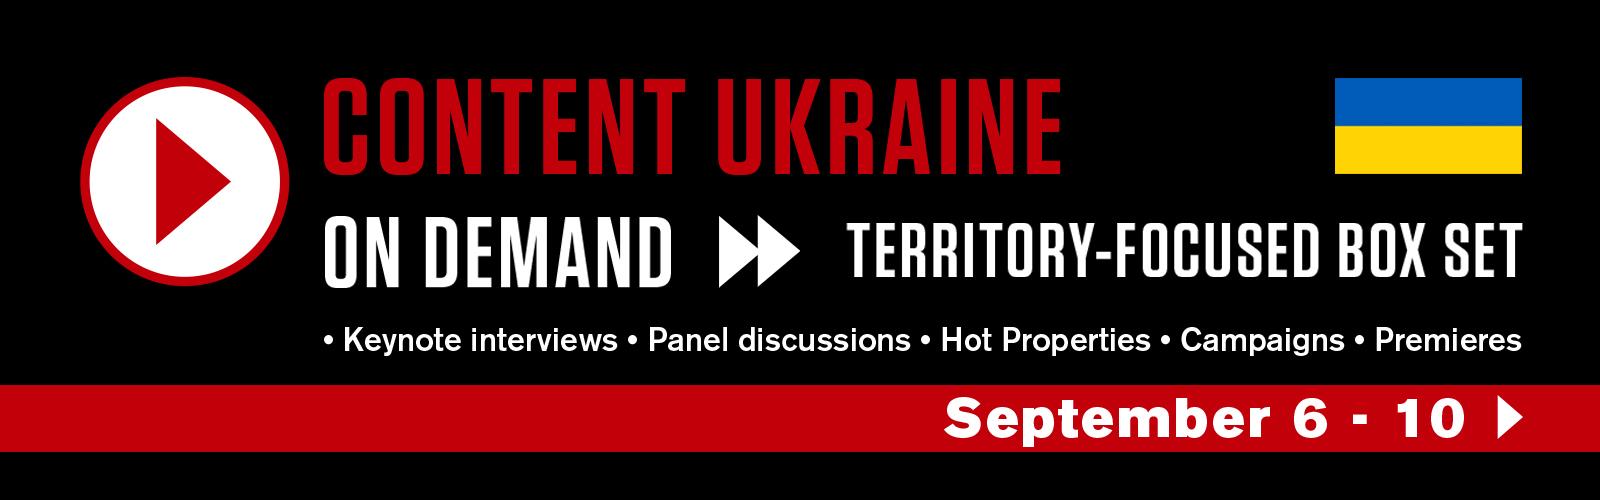 Content Ukraine On Demand